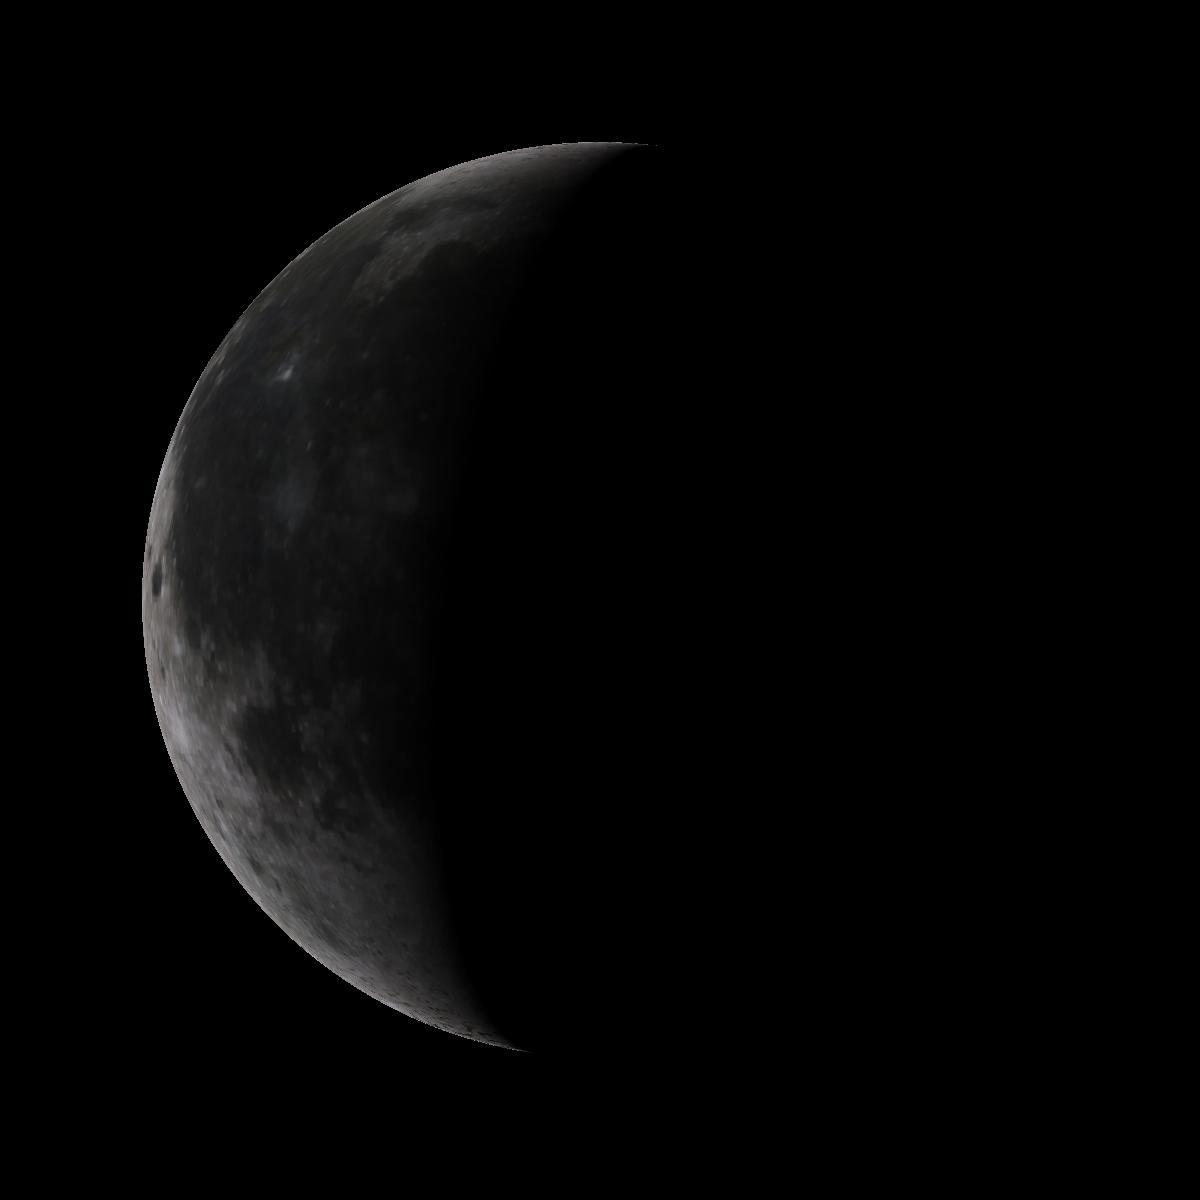 Lune du 18 mars 2020